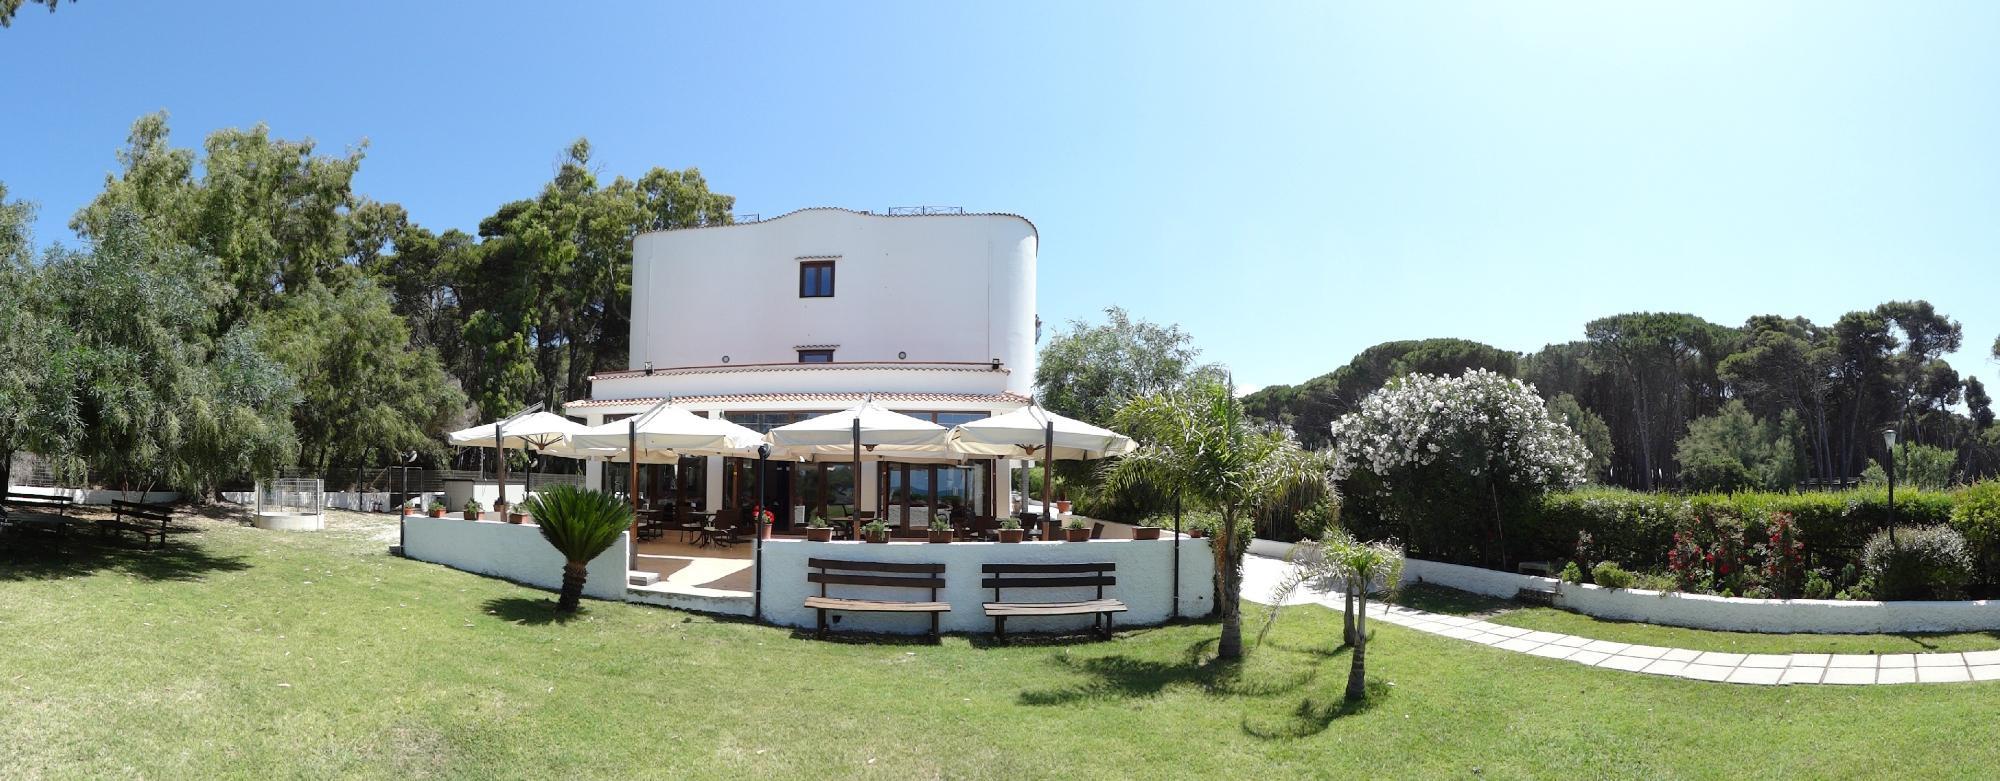 Travel Precious hotel park of the principles Paestum